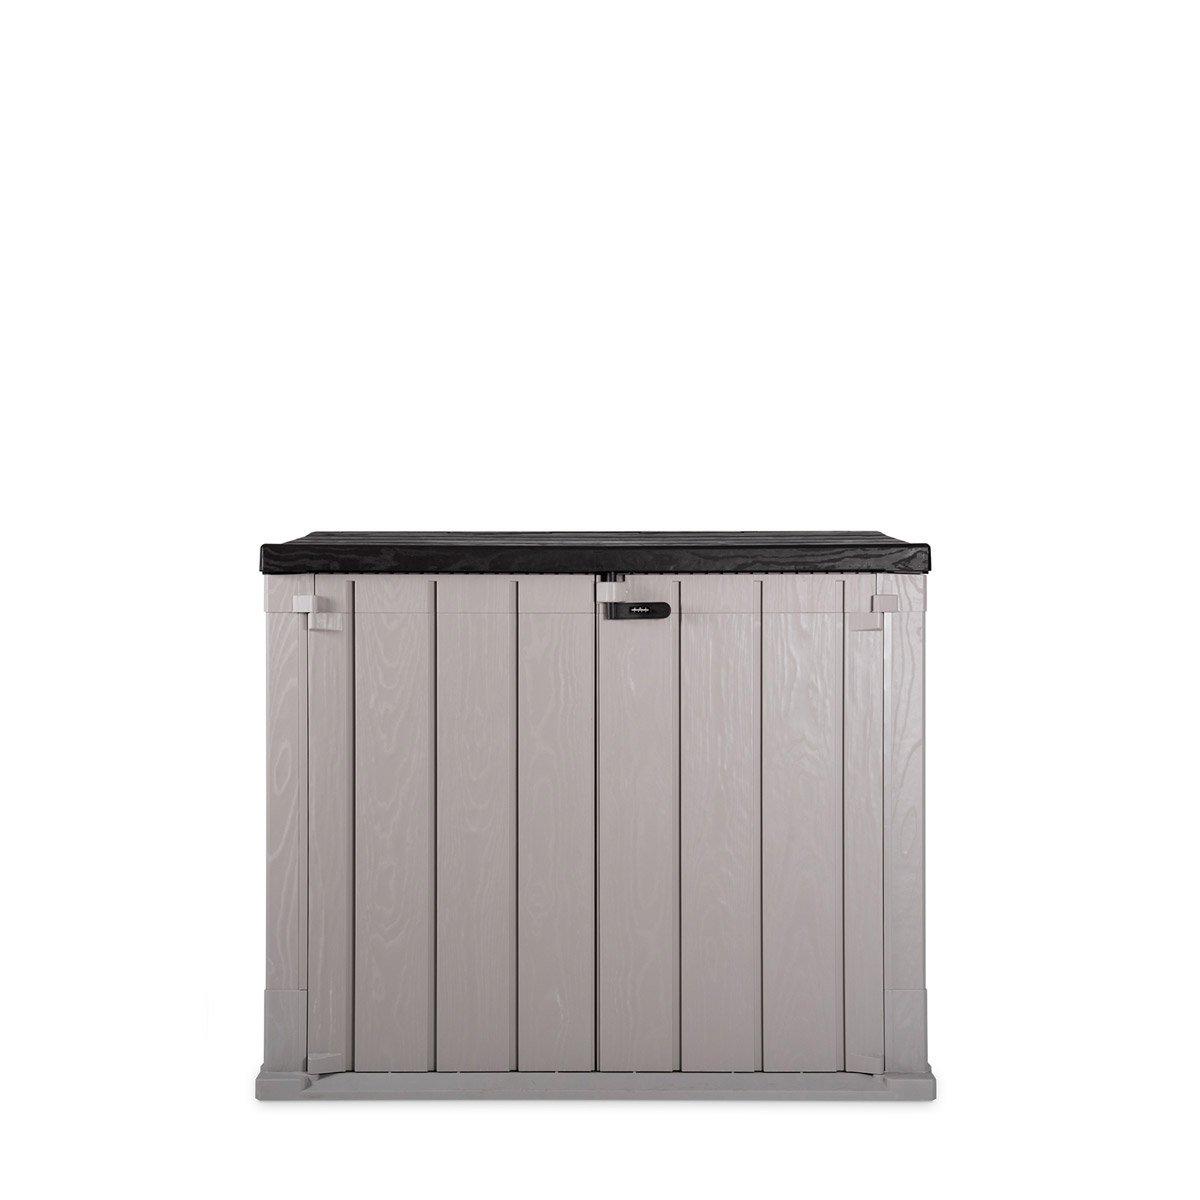 Toomax Storaway 842L Wood Effect Garden Storage Shed - Grey